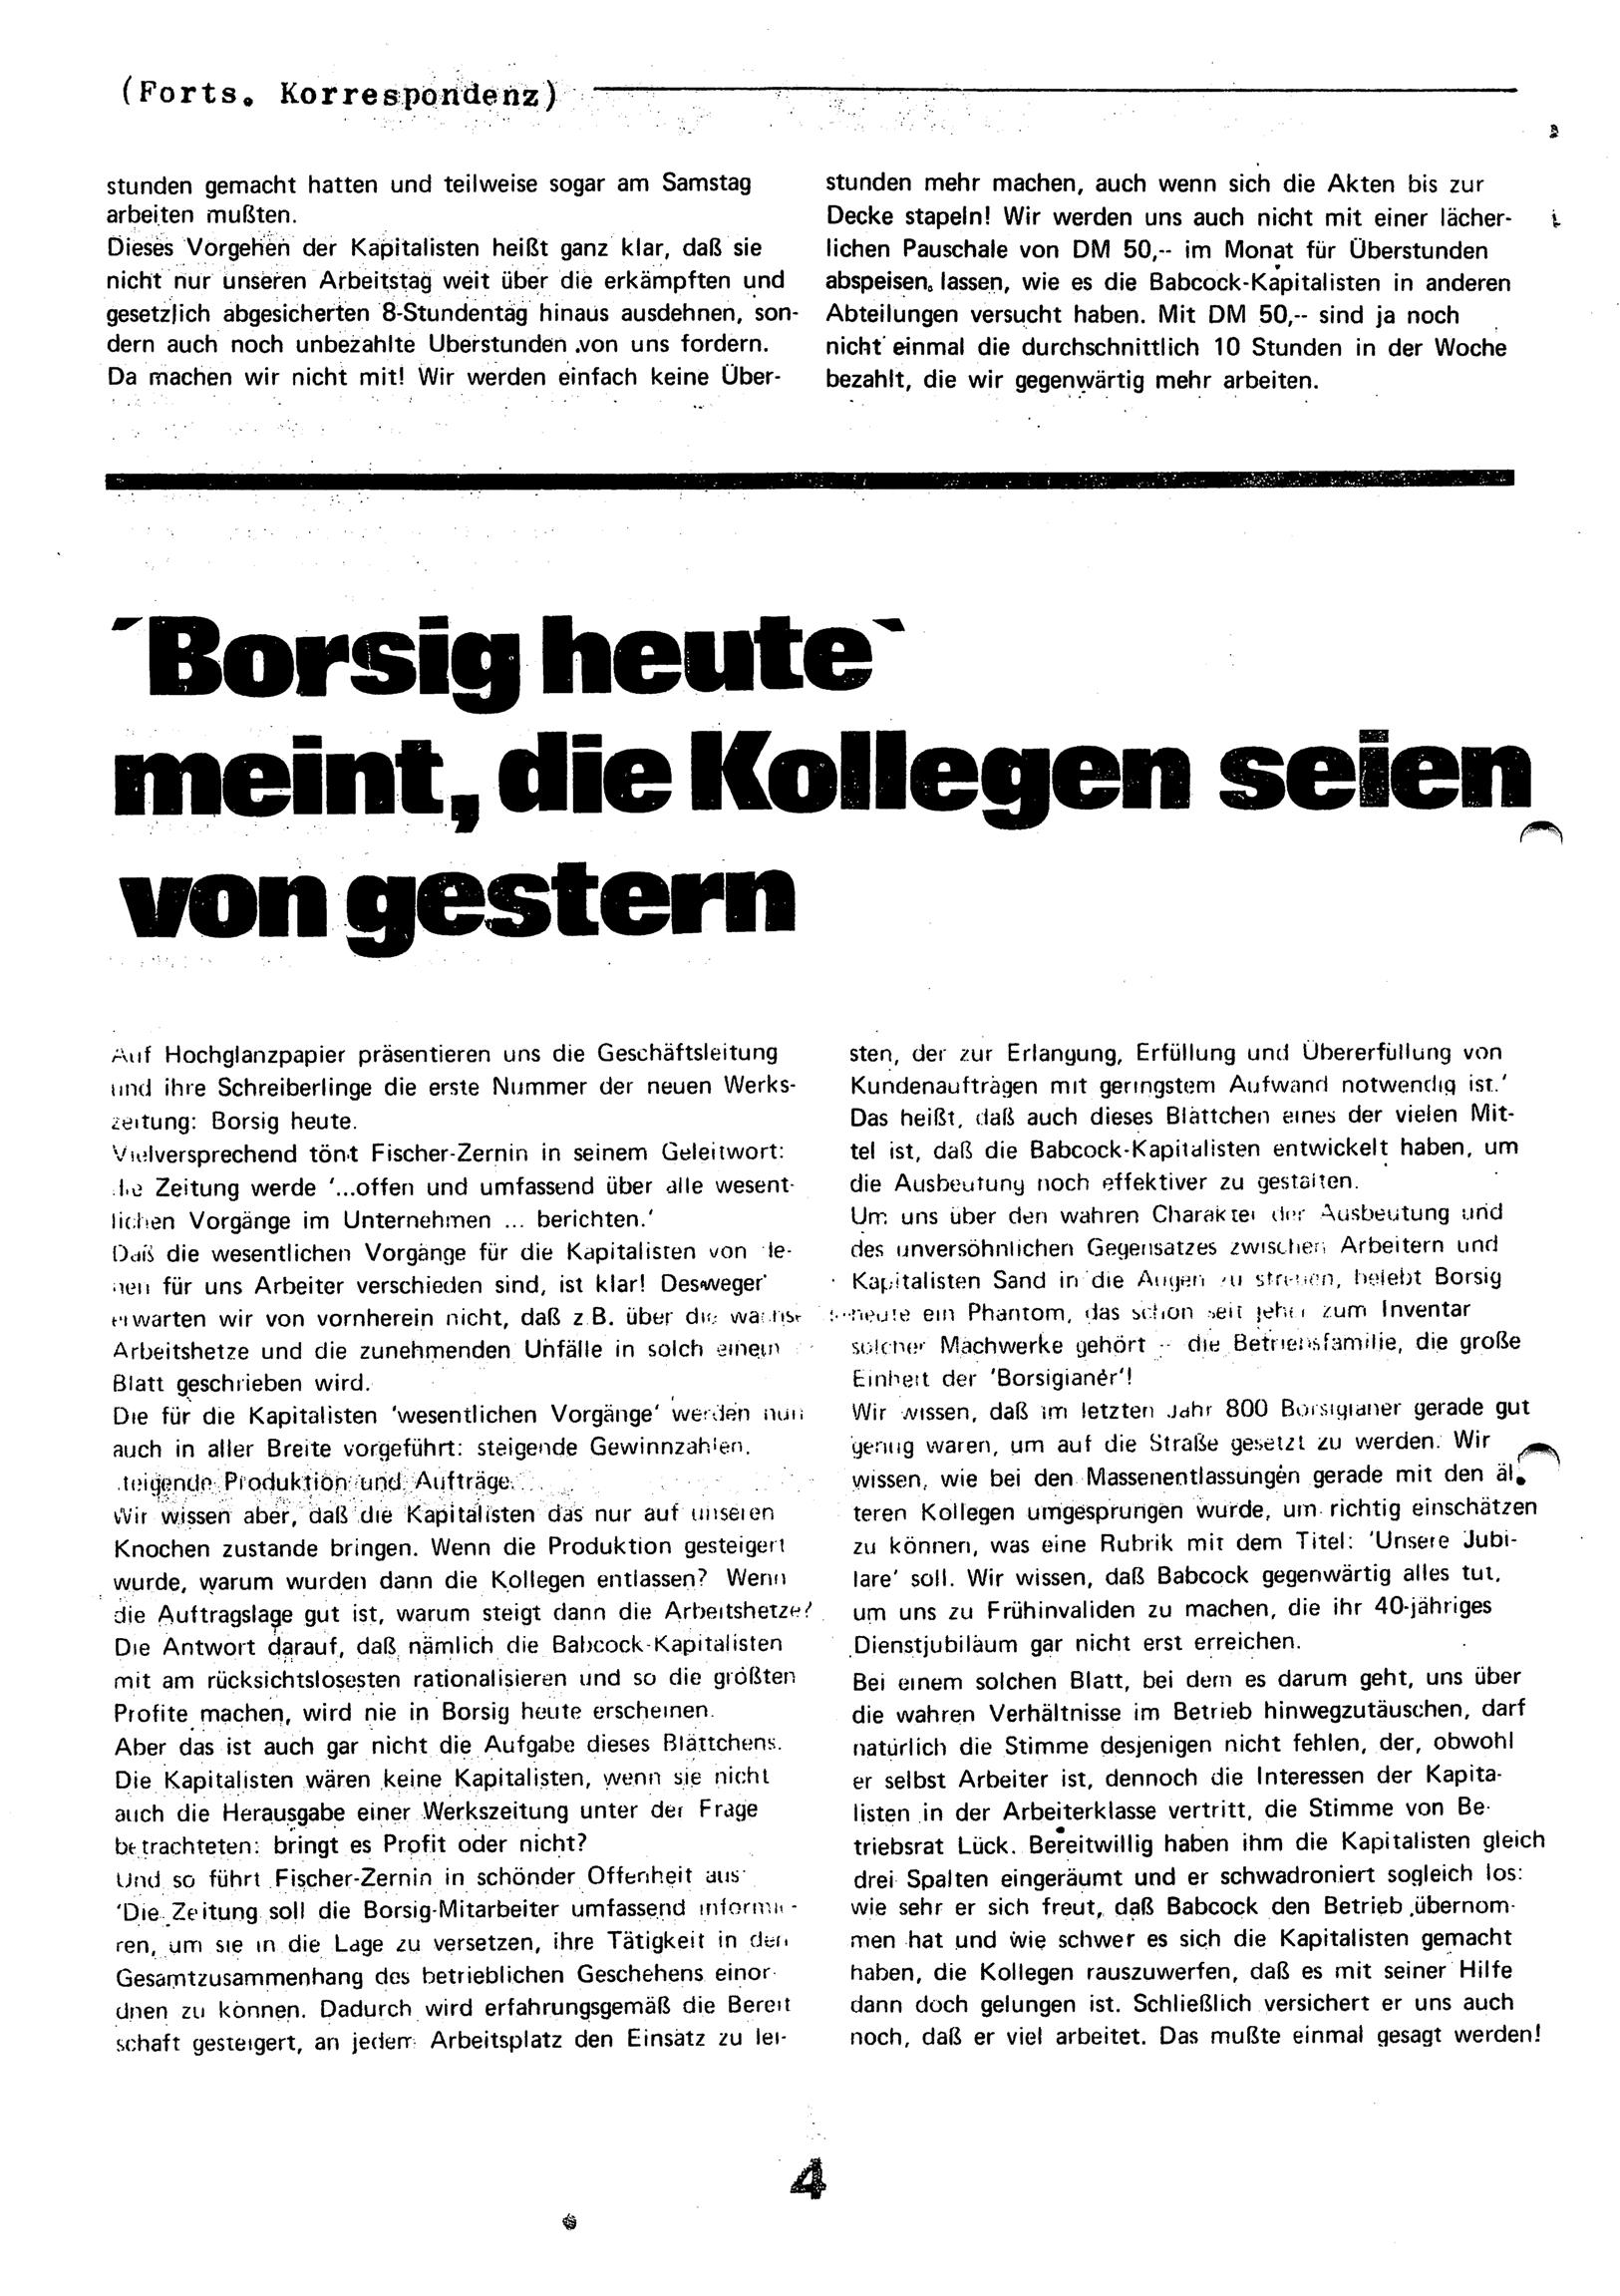 Berlin_Borsig337